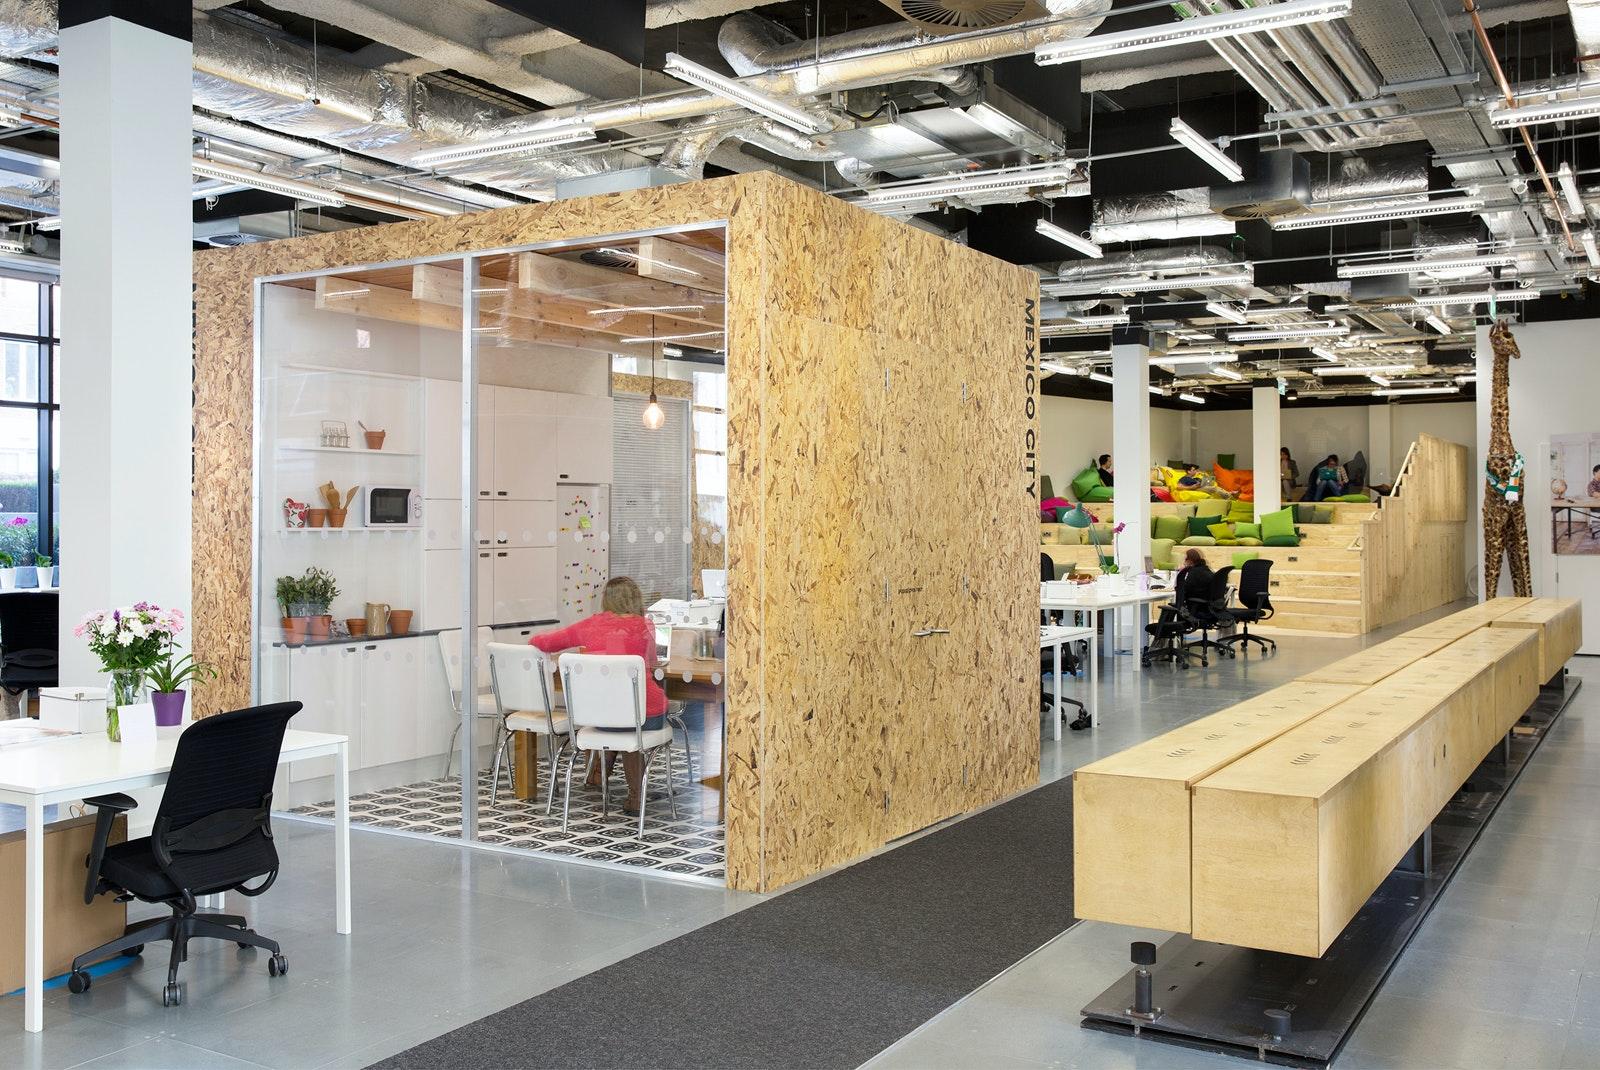 Die Airbnb-Zentrale in Dublin (heneghan peng architects)